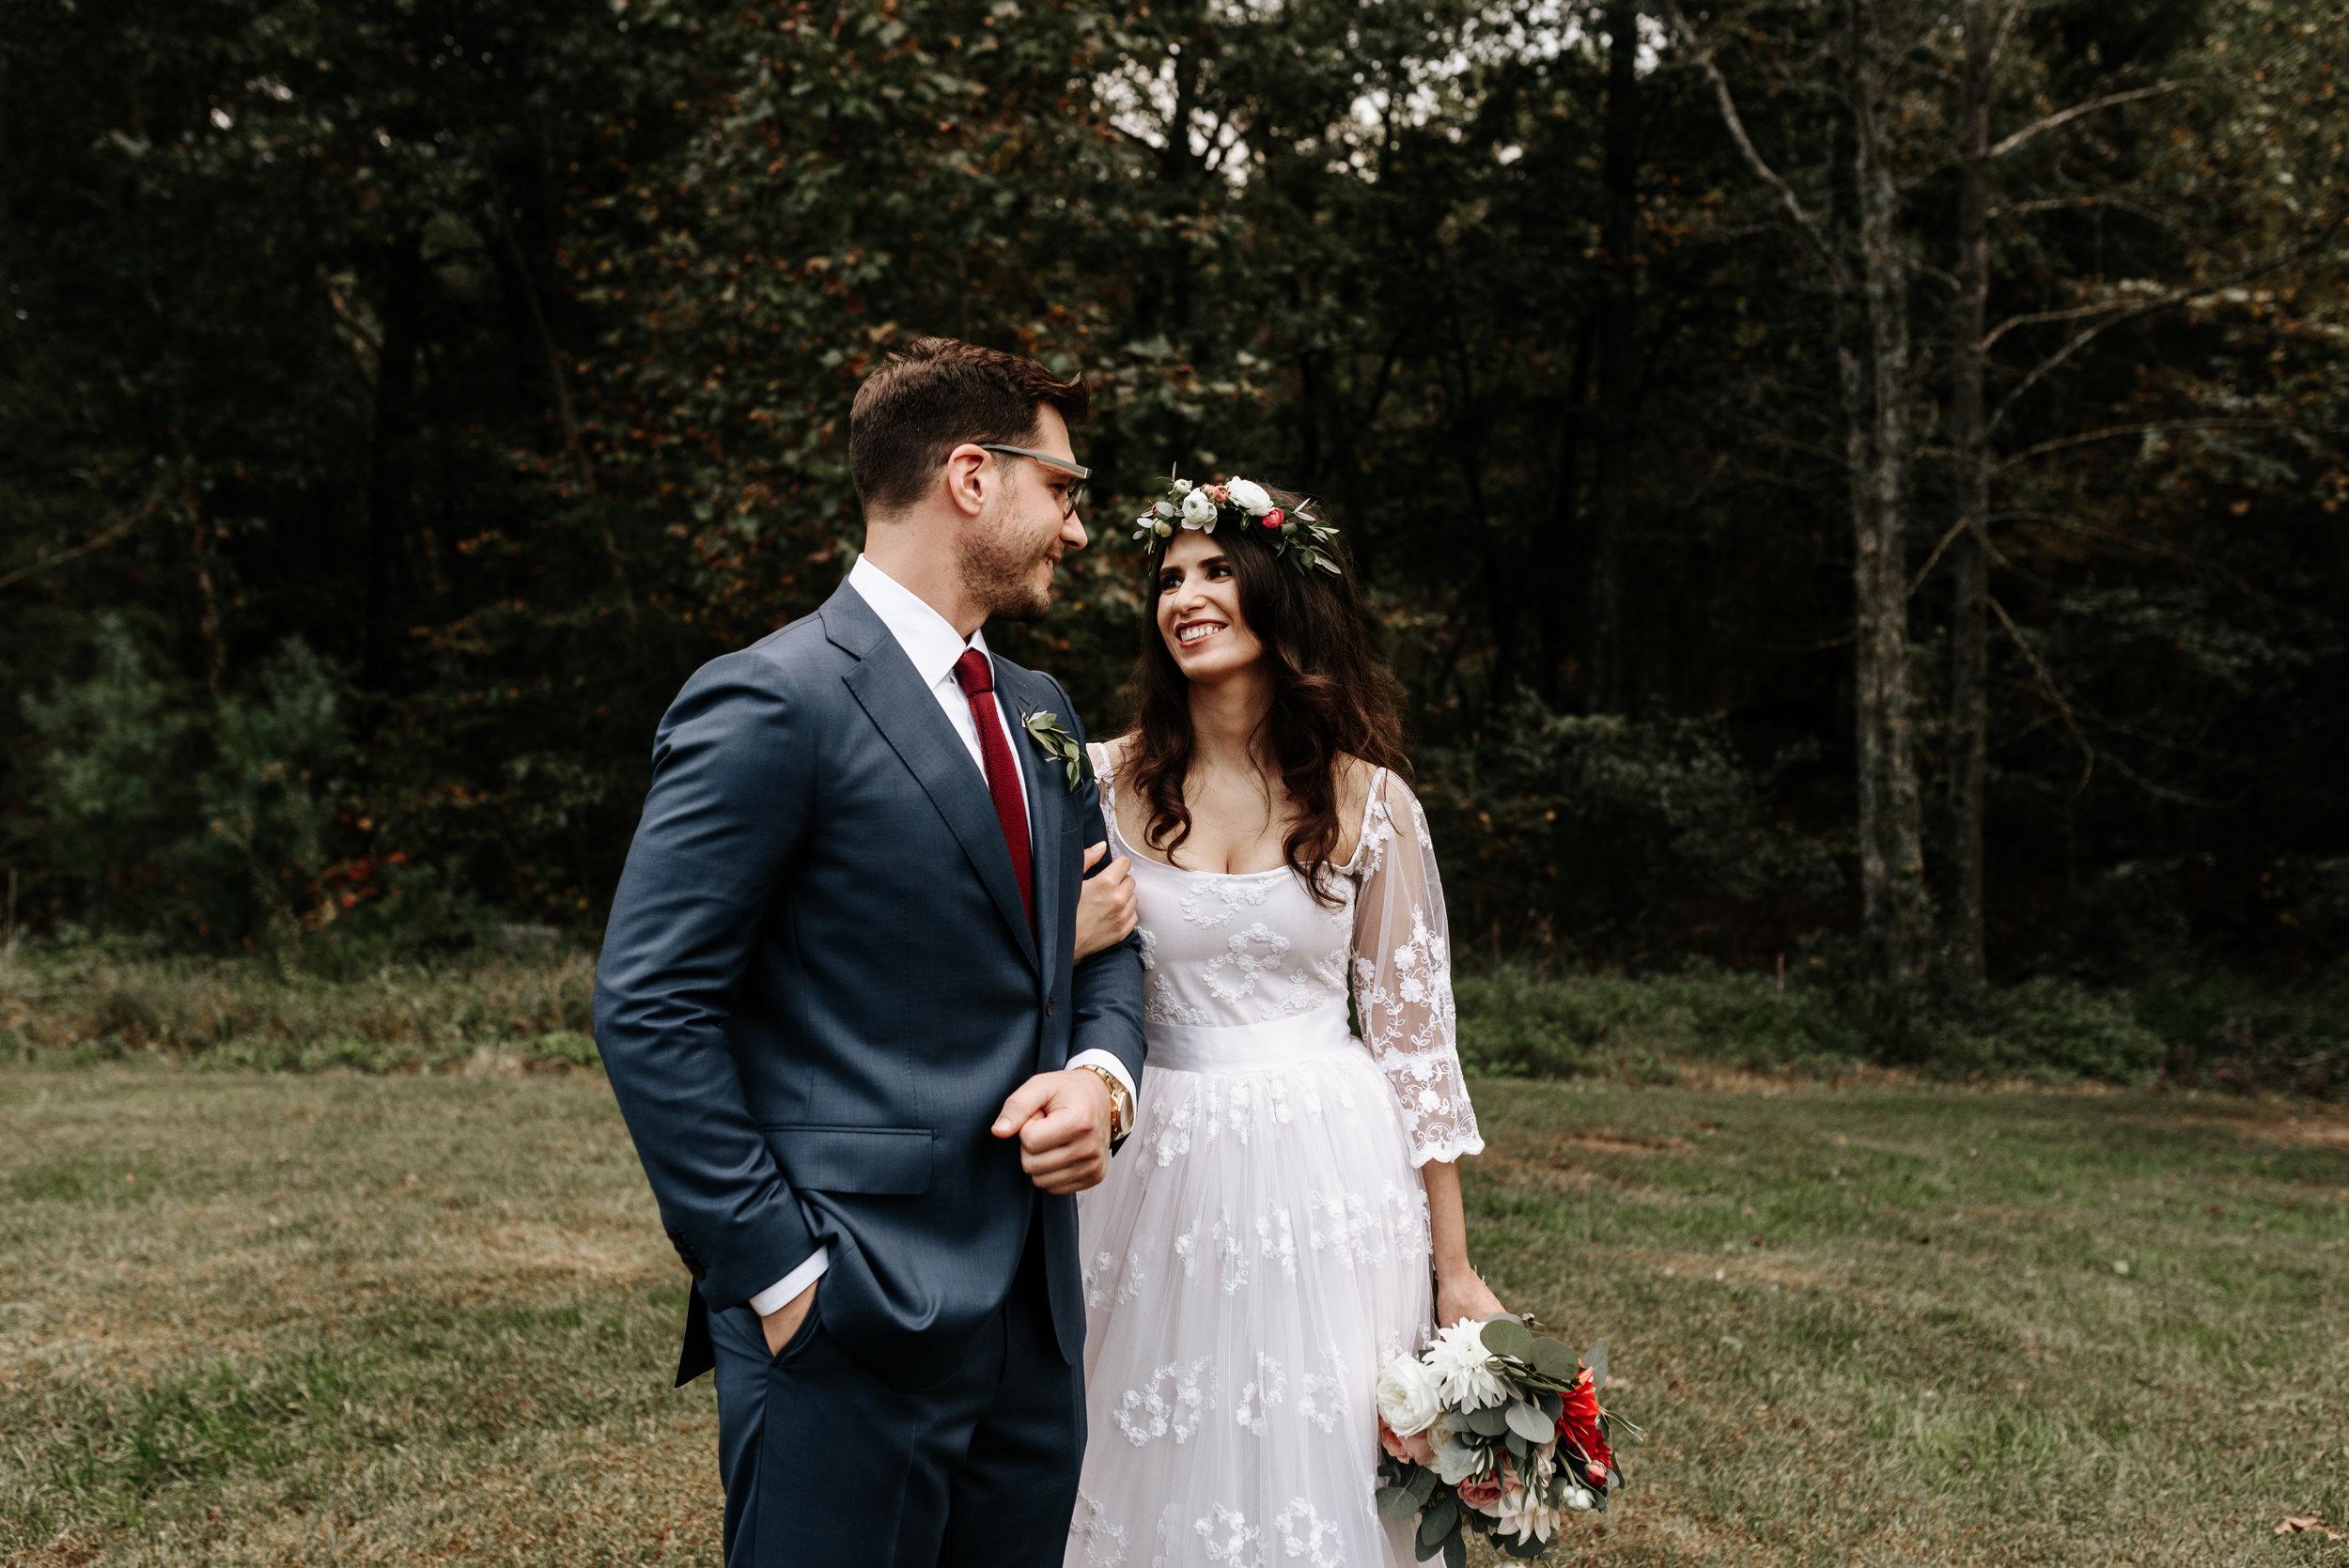 Veritas-Vineyards-and-Winery-Wedding-Photography-Afton-Virginia-Yasmin-Seth-Photography-by-V-9494.jpg